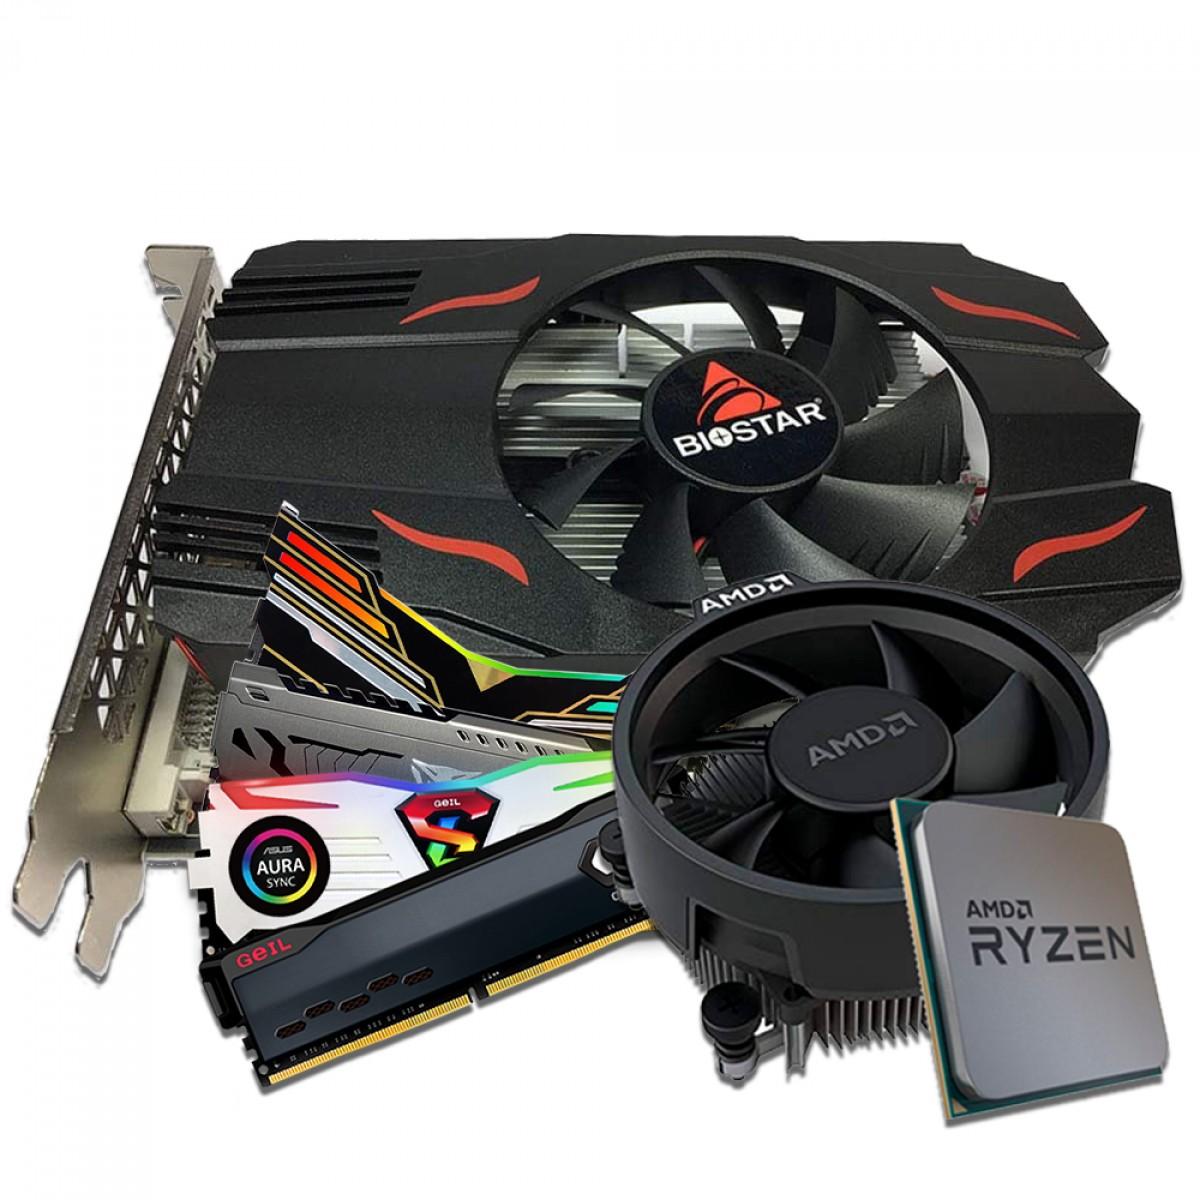 Kit Upgrade Biostar Radeon RX 550 4GB + AMD Ryzen 5 3500 + Memória DDR4 16GB (2x8GB) 3000Mhz